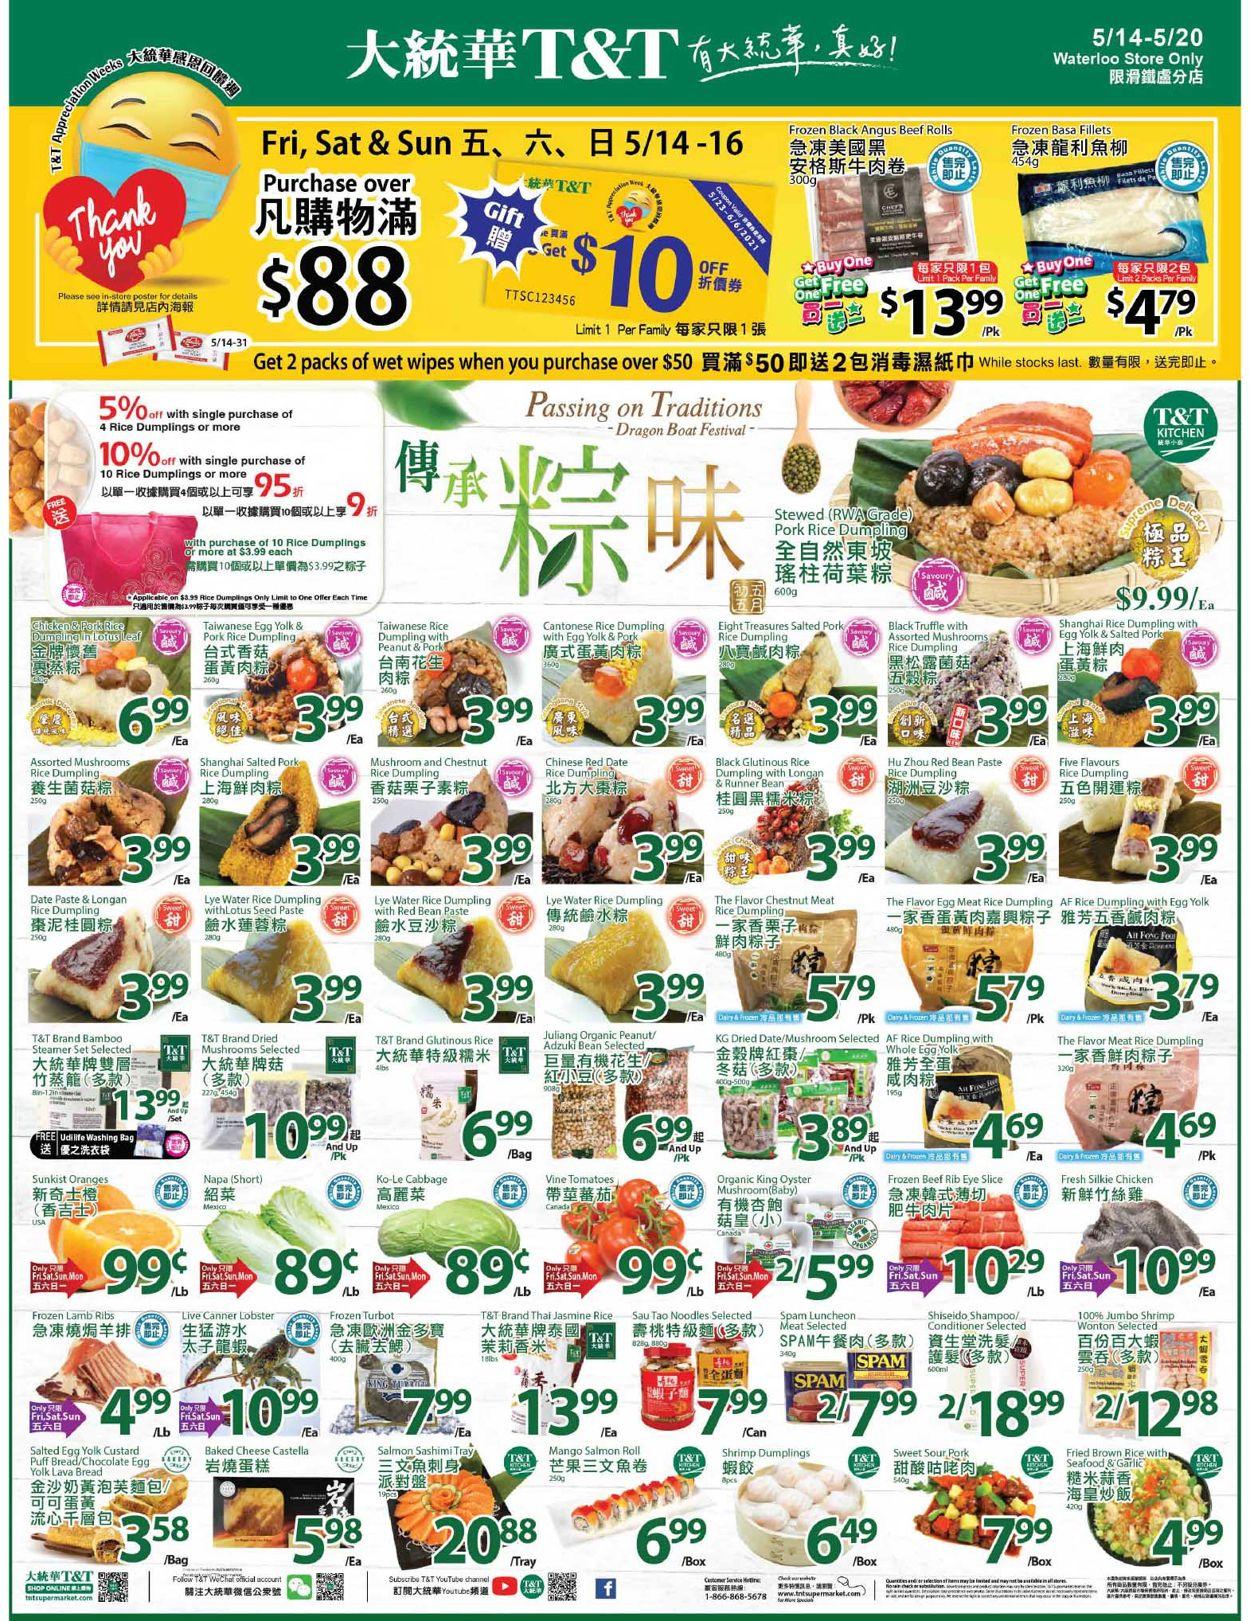 T&T Supermarket - Waterloo Flyer - 05/14-05/20/2021